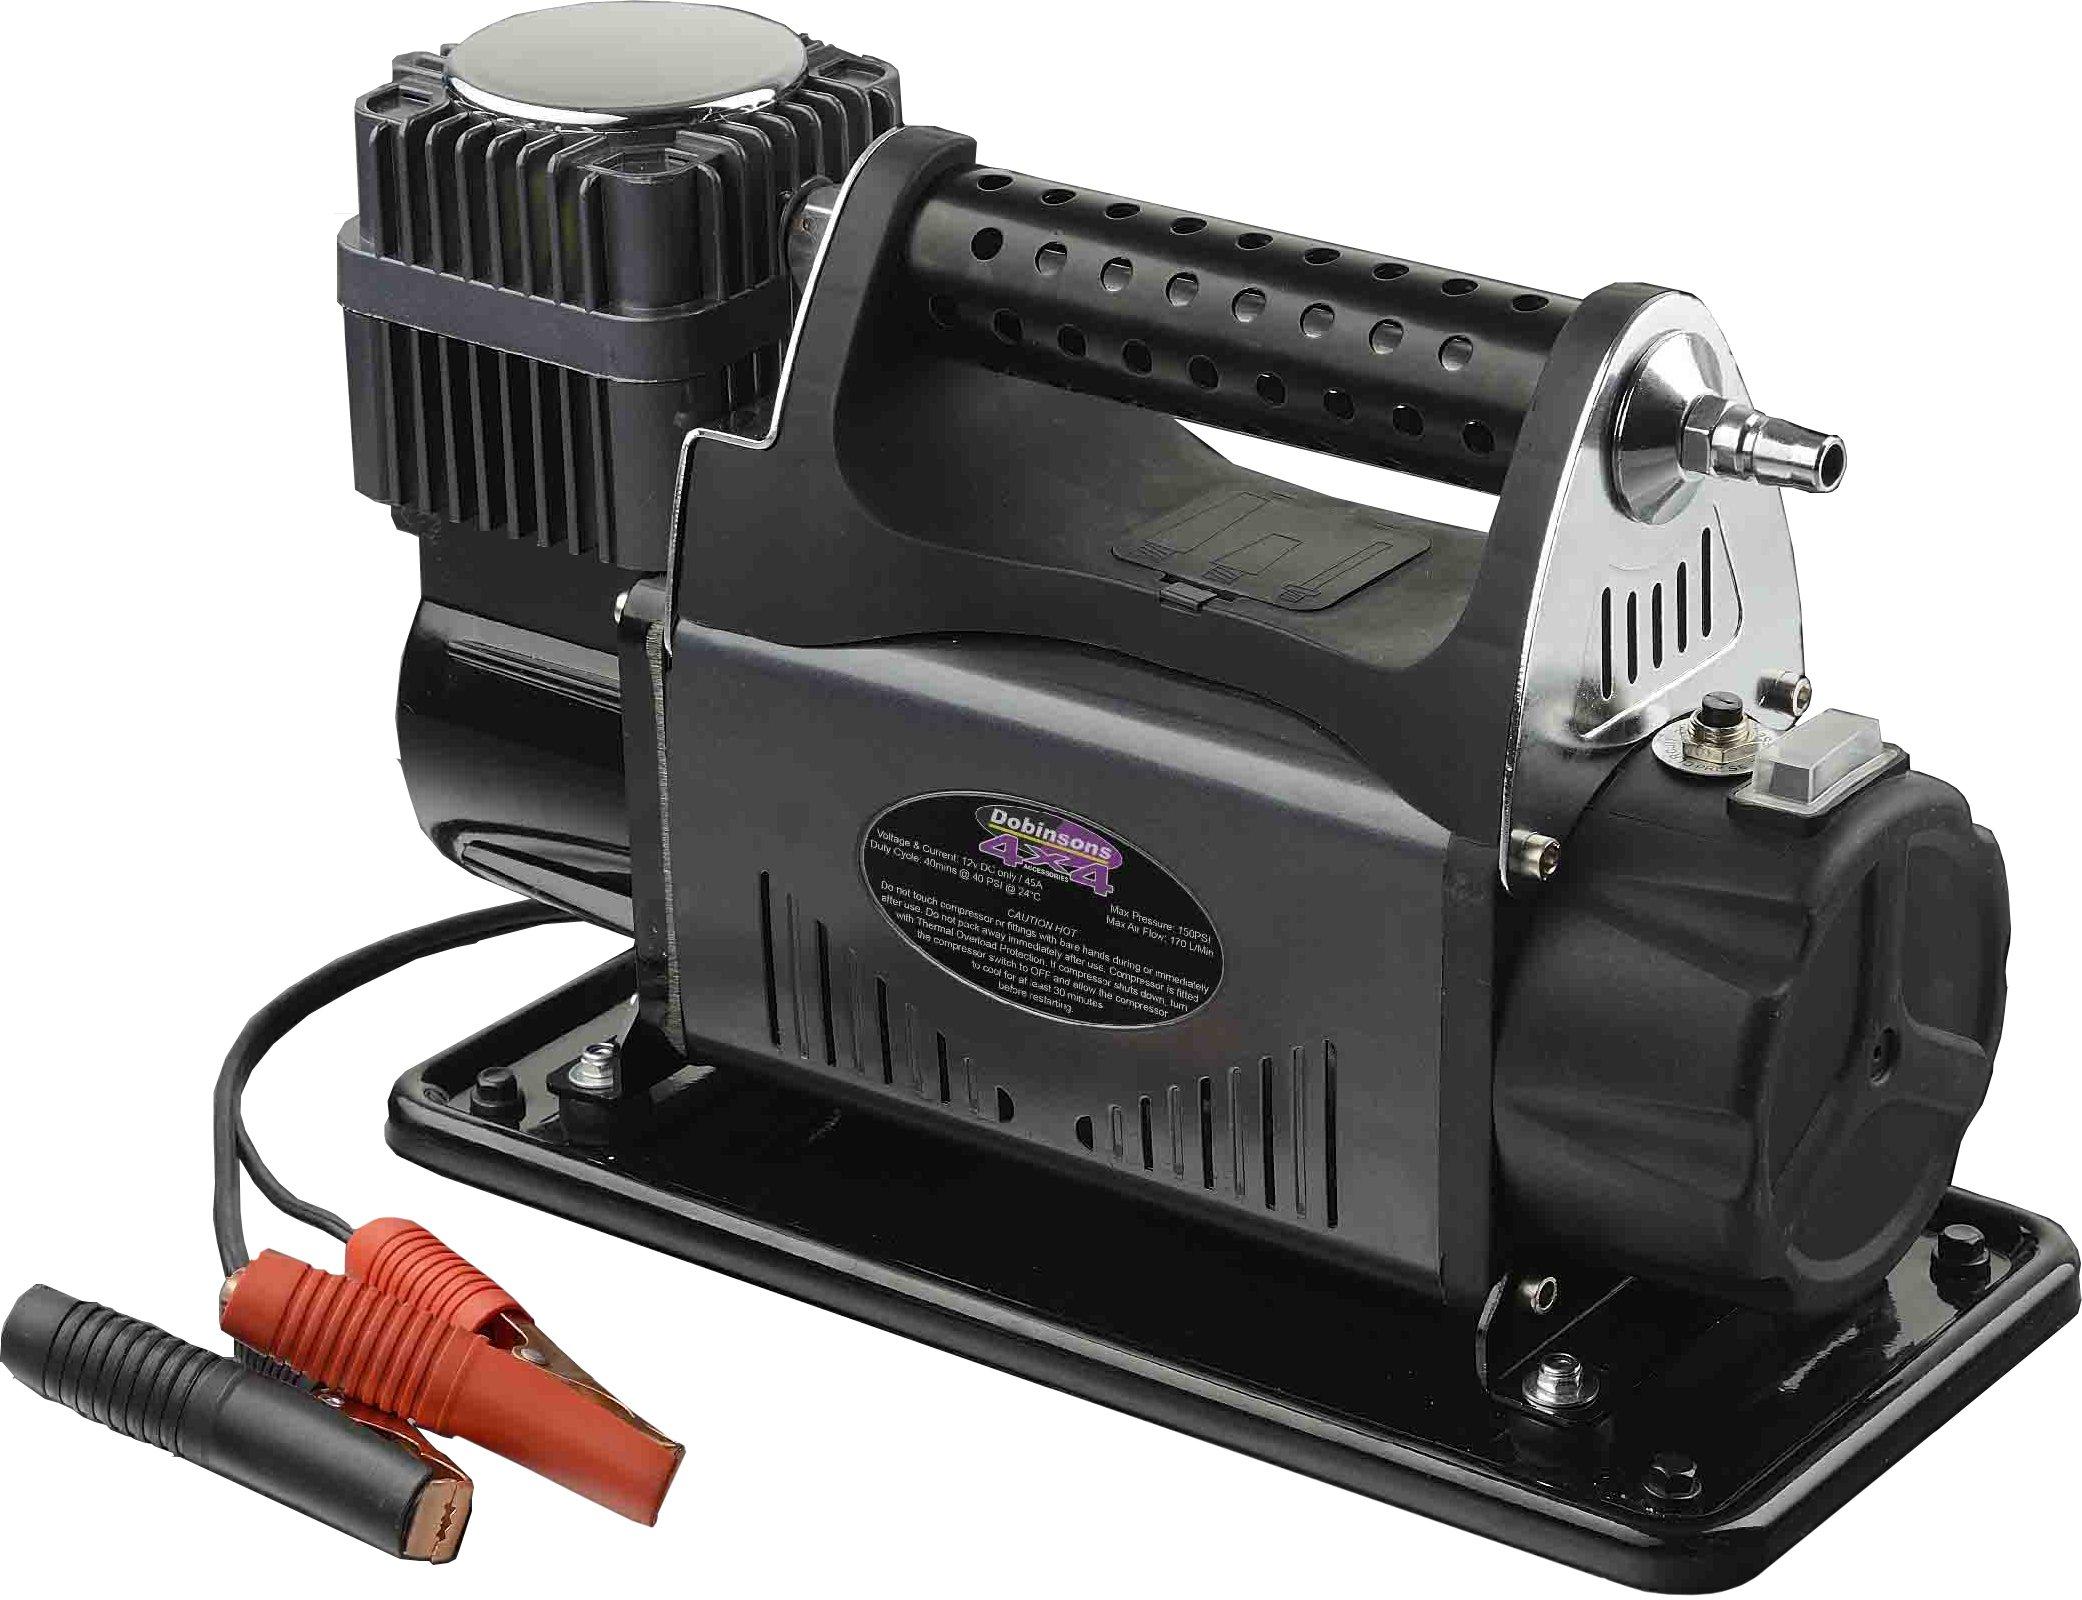 Dobinsons 4x4 Portable 12V High Output Air Compressor Kit with Bag, Hose and Gauge